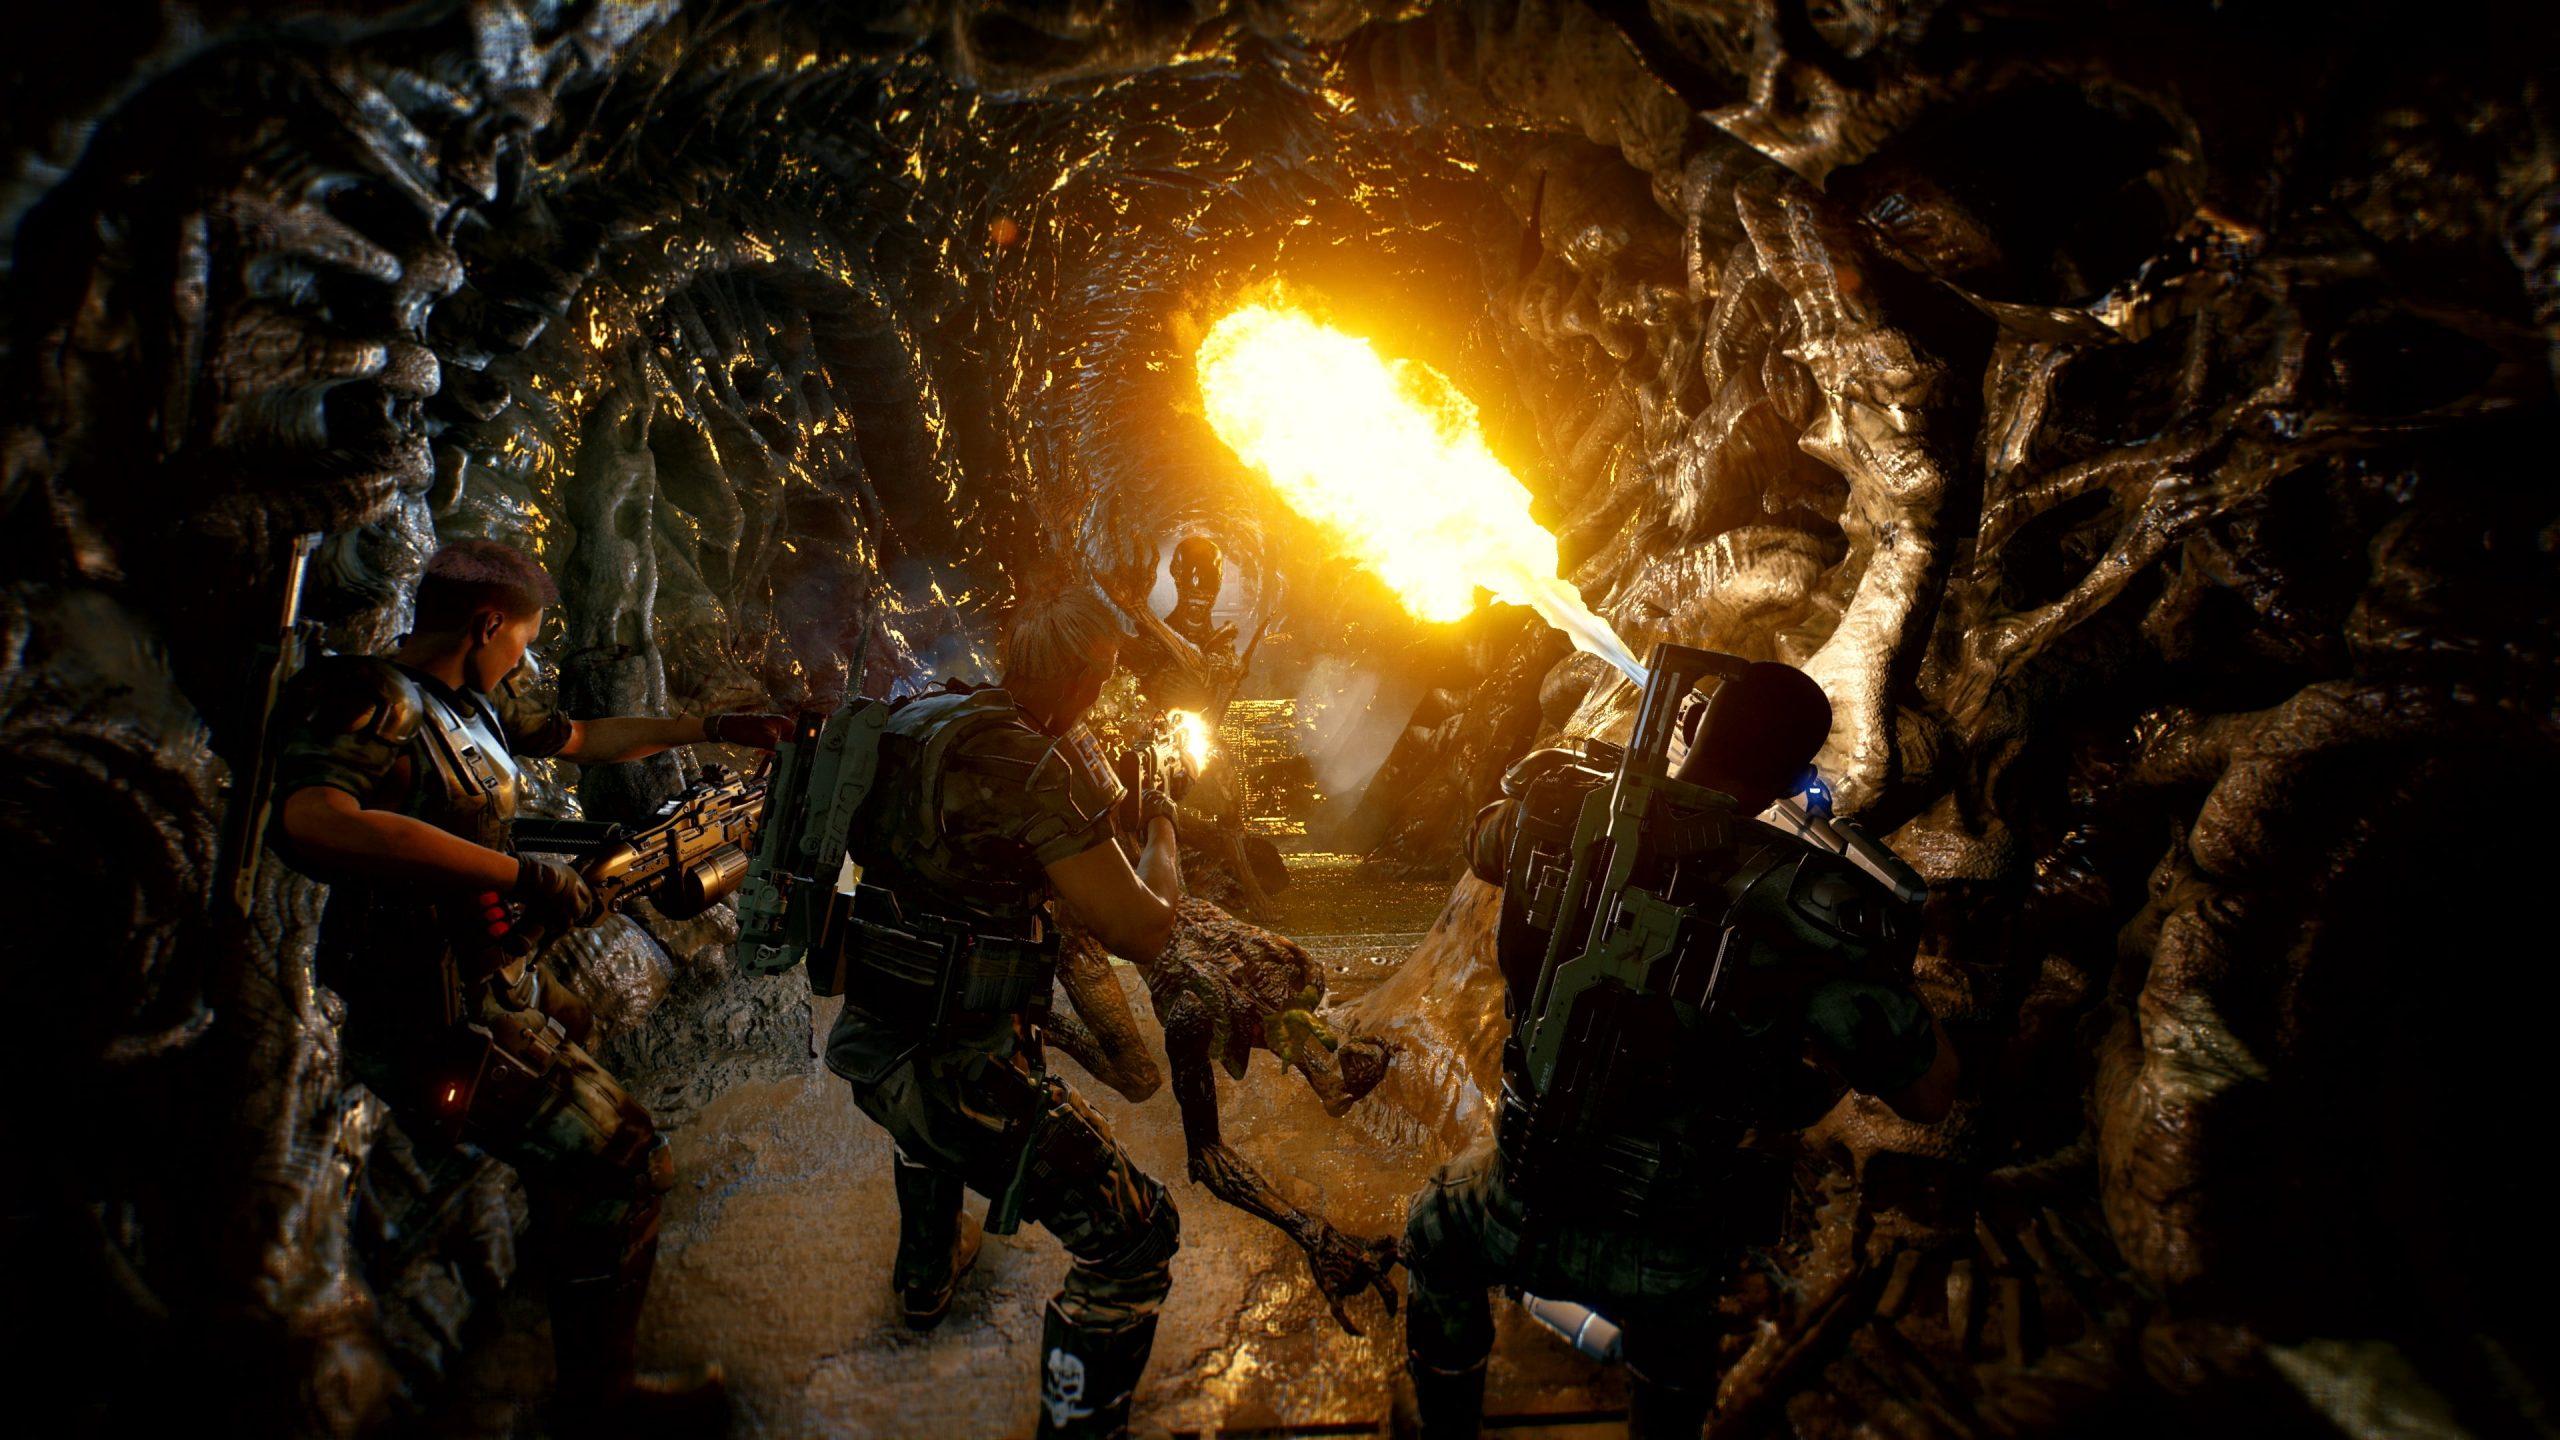 Cold Iron анонсировала кооперативный шутер Aliens: Fireteam 2